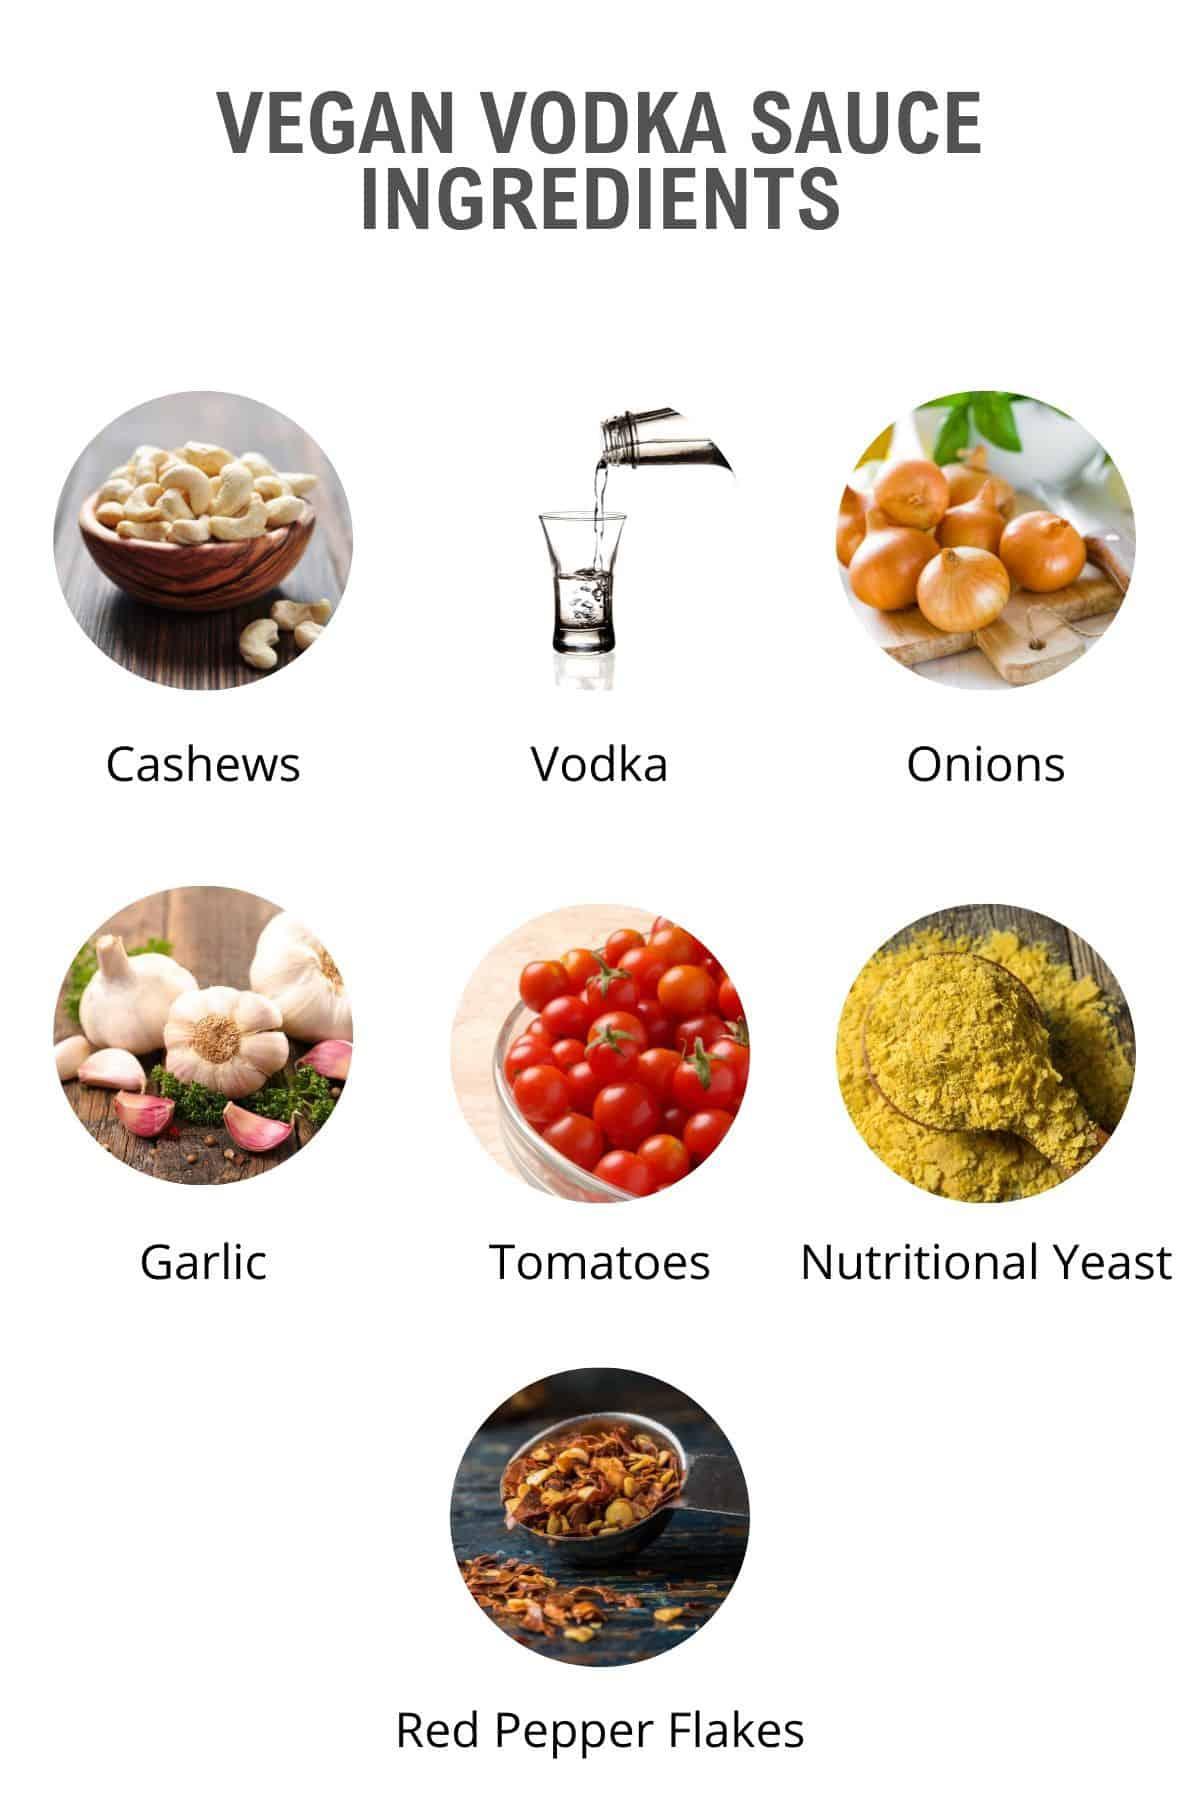 vegan vodka sauce ingredients